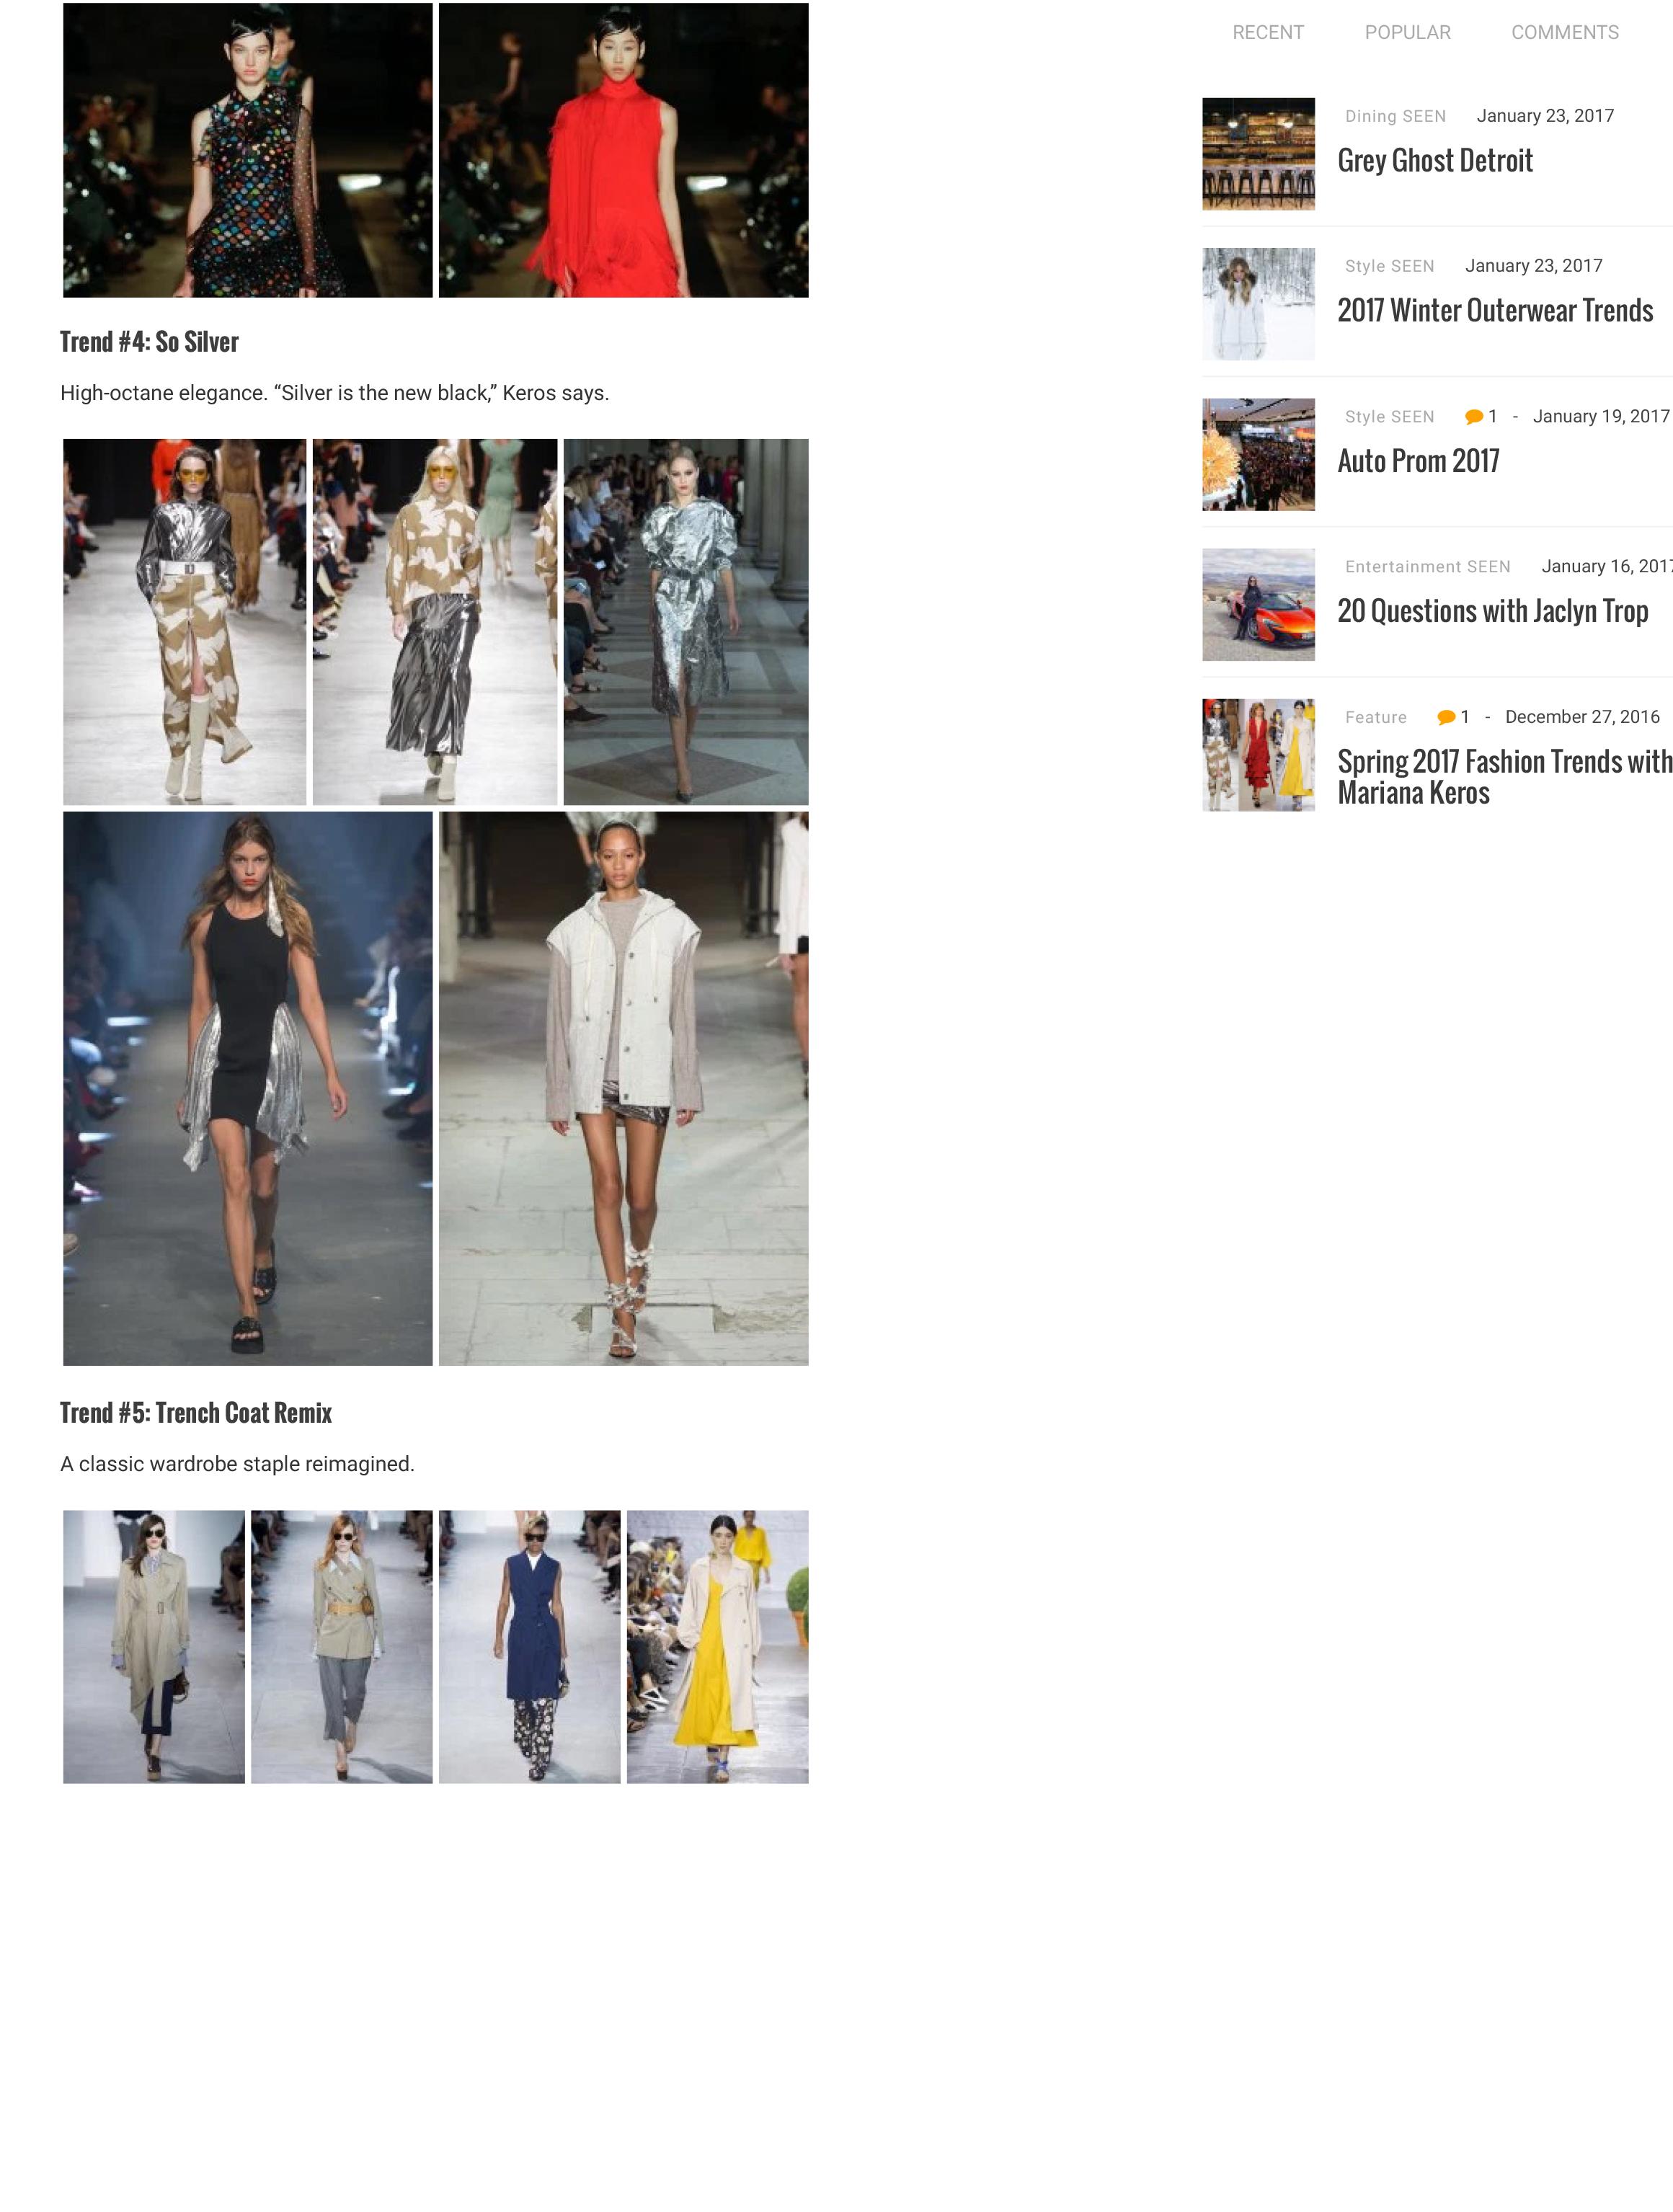 SeenMagazinepage3.jpg